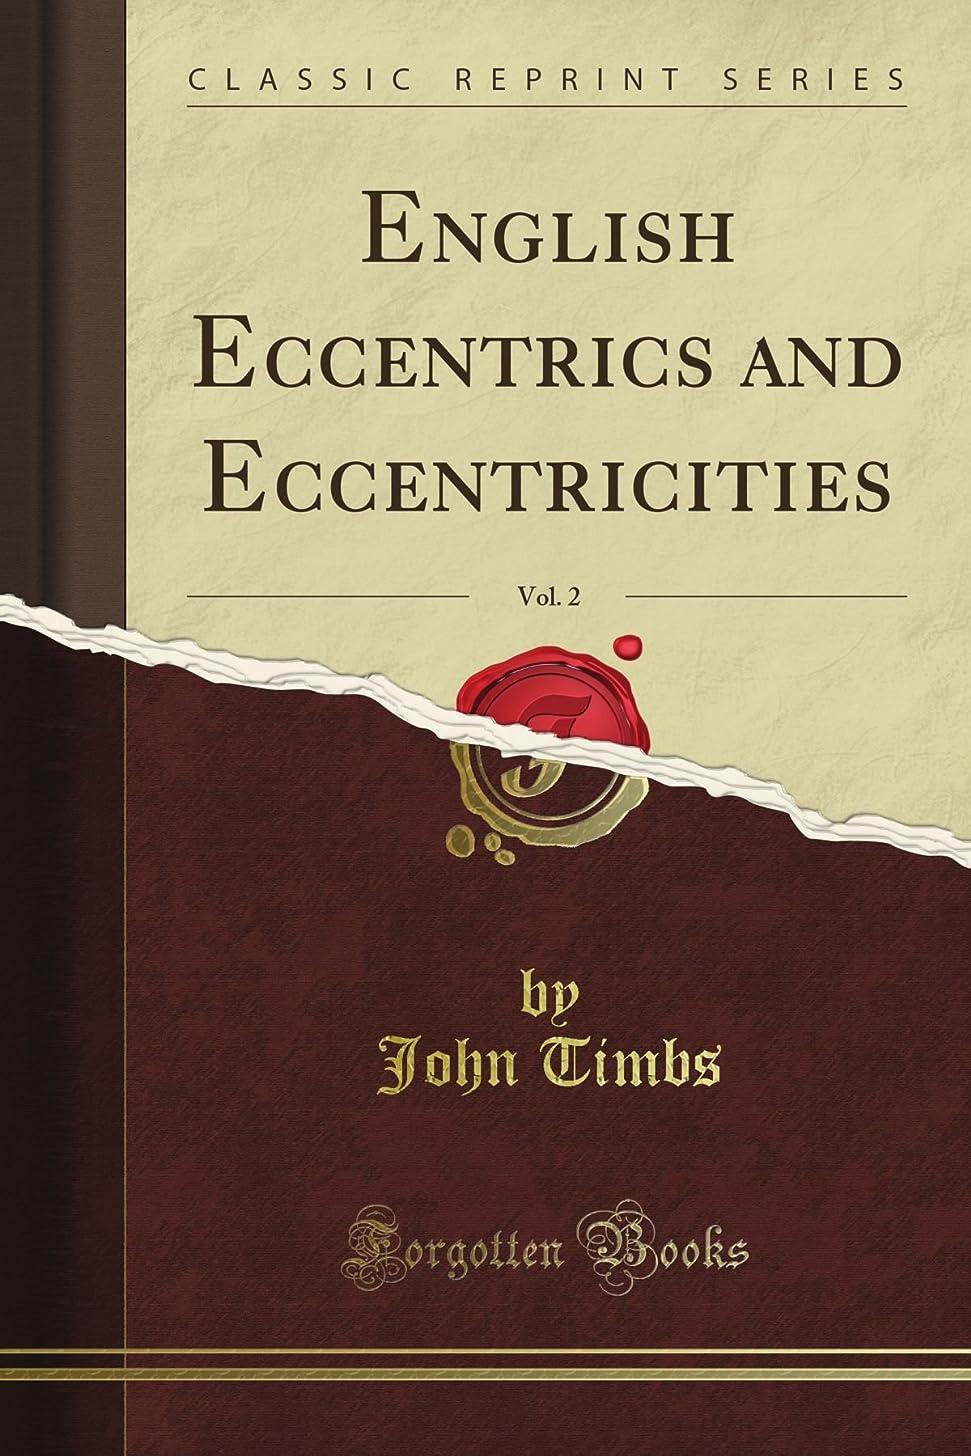 English Eccentrics and Eccentricities, Vol. 2 (Classic Reprint)